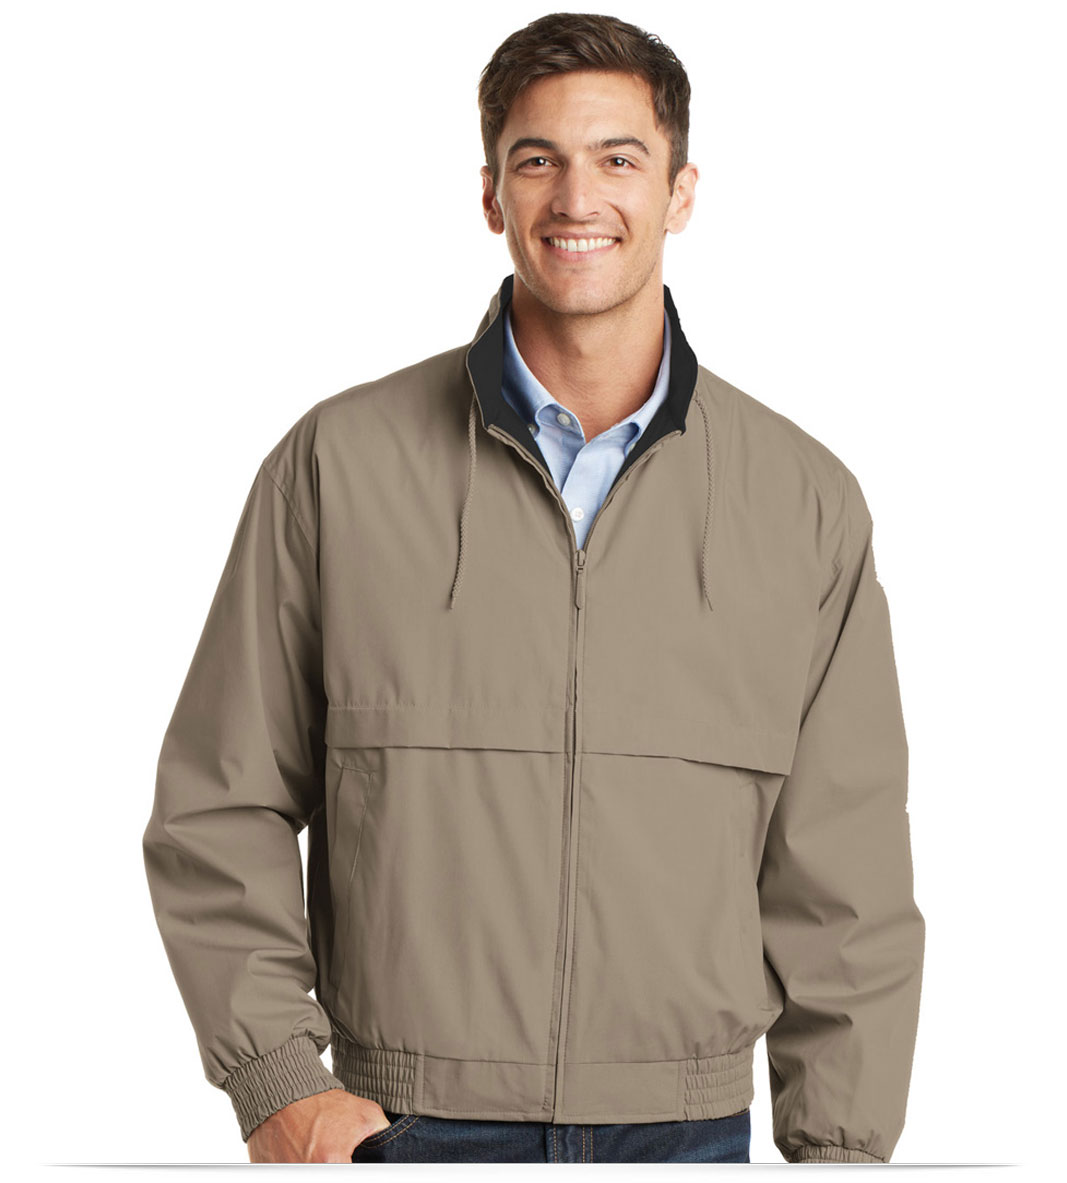 Personalized Golf Jacket